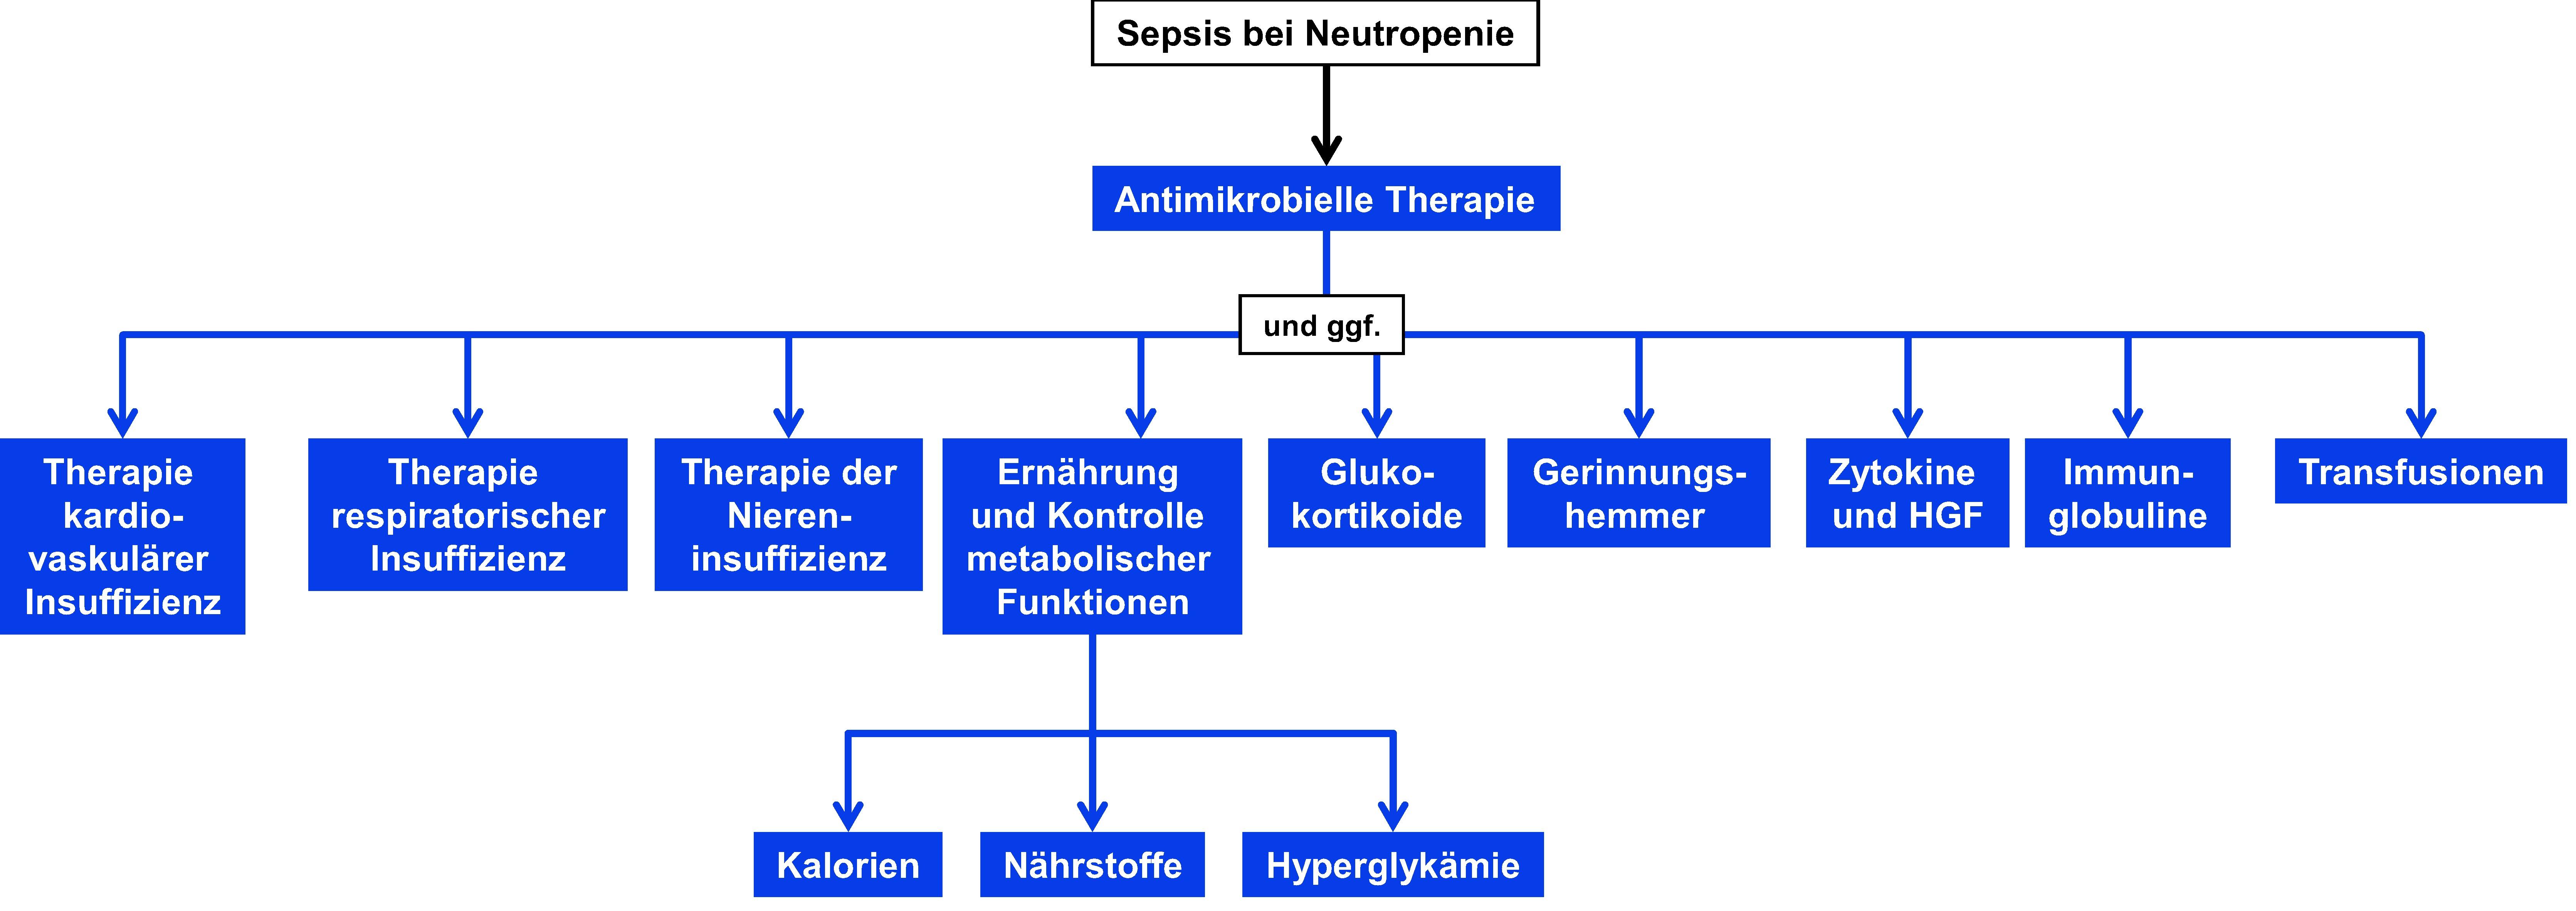 Therapie bei Sepsis in Neutropenie